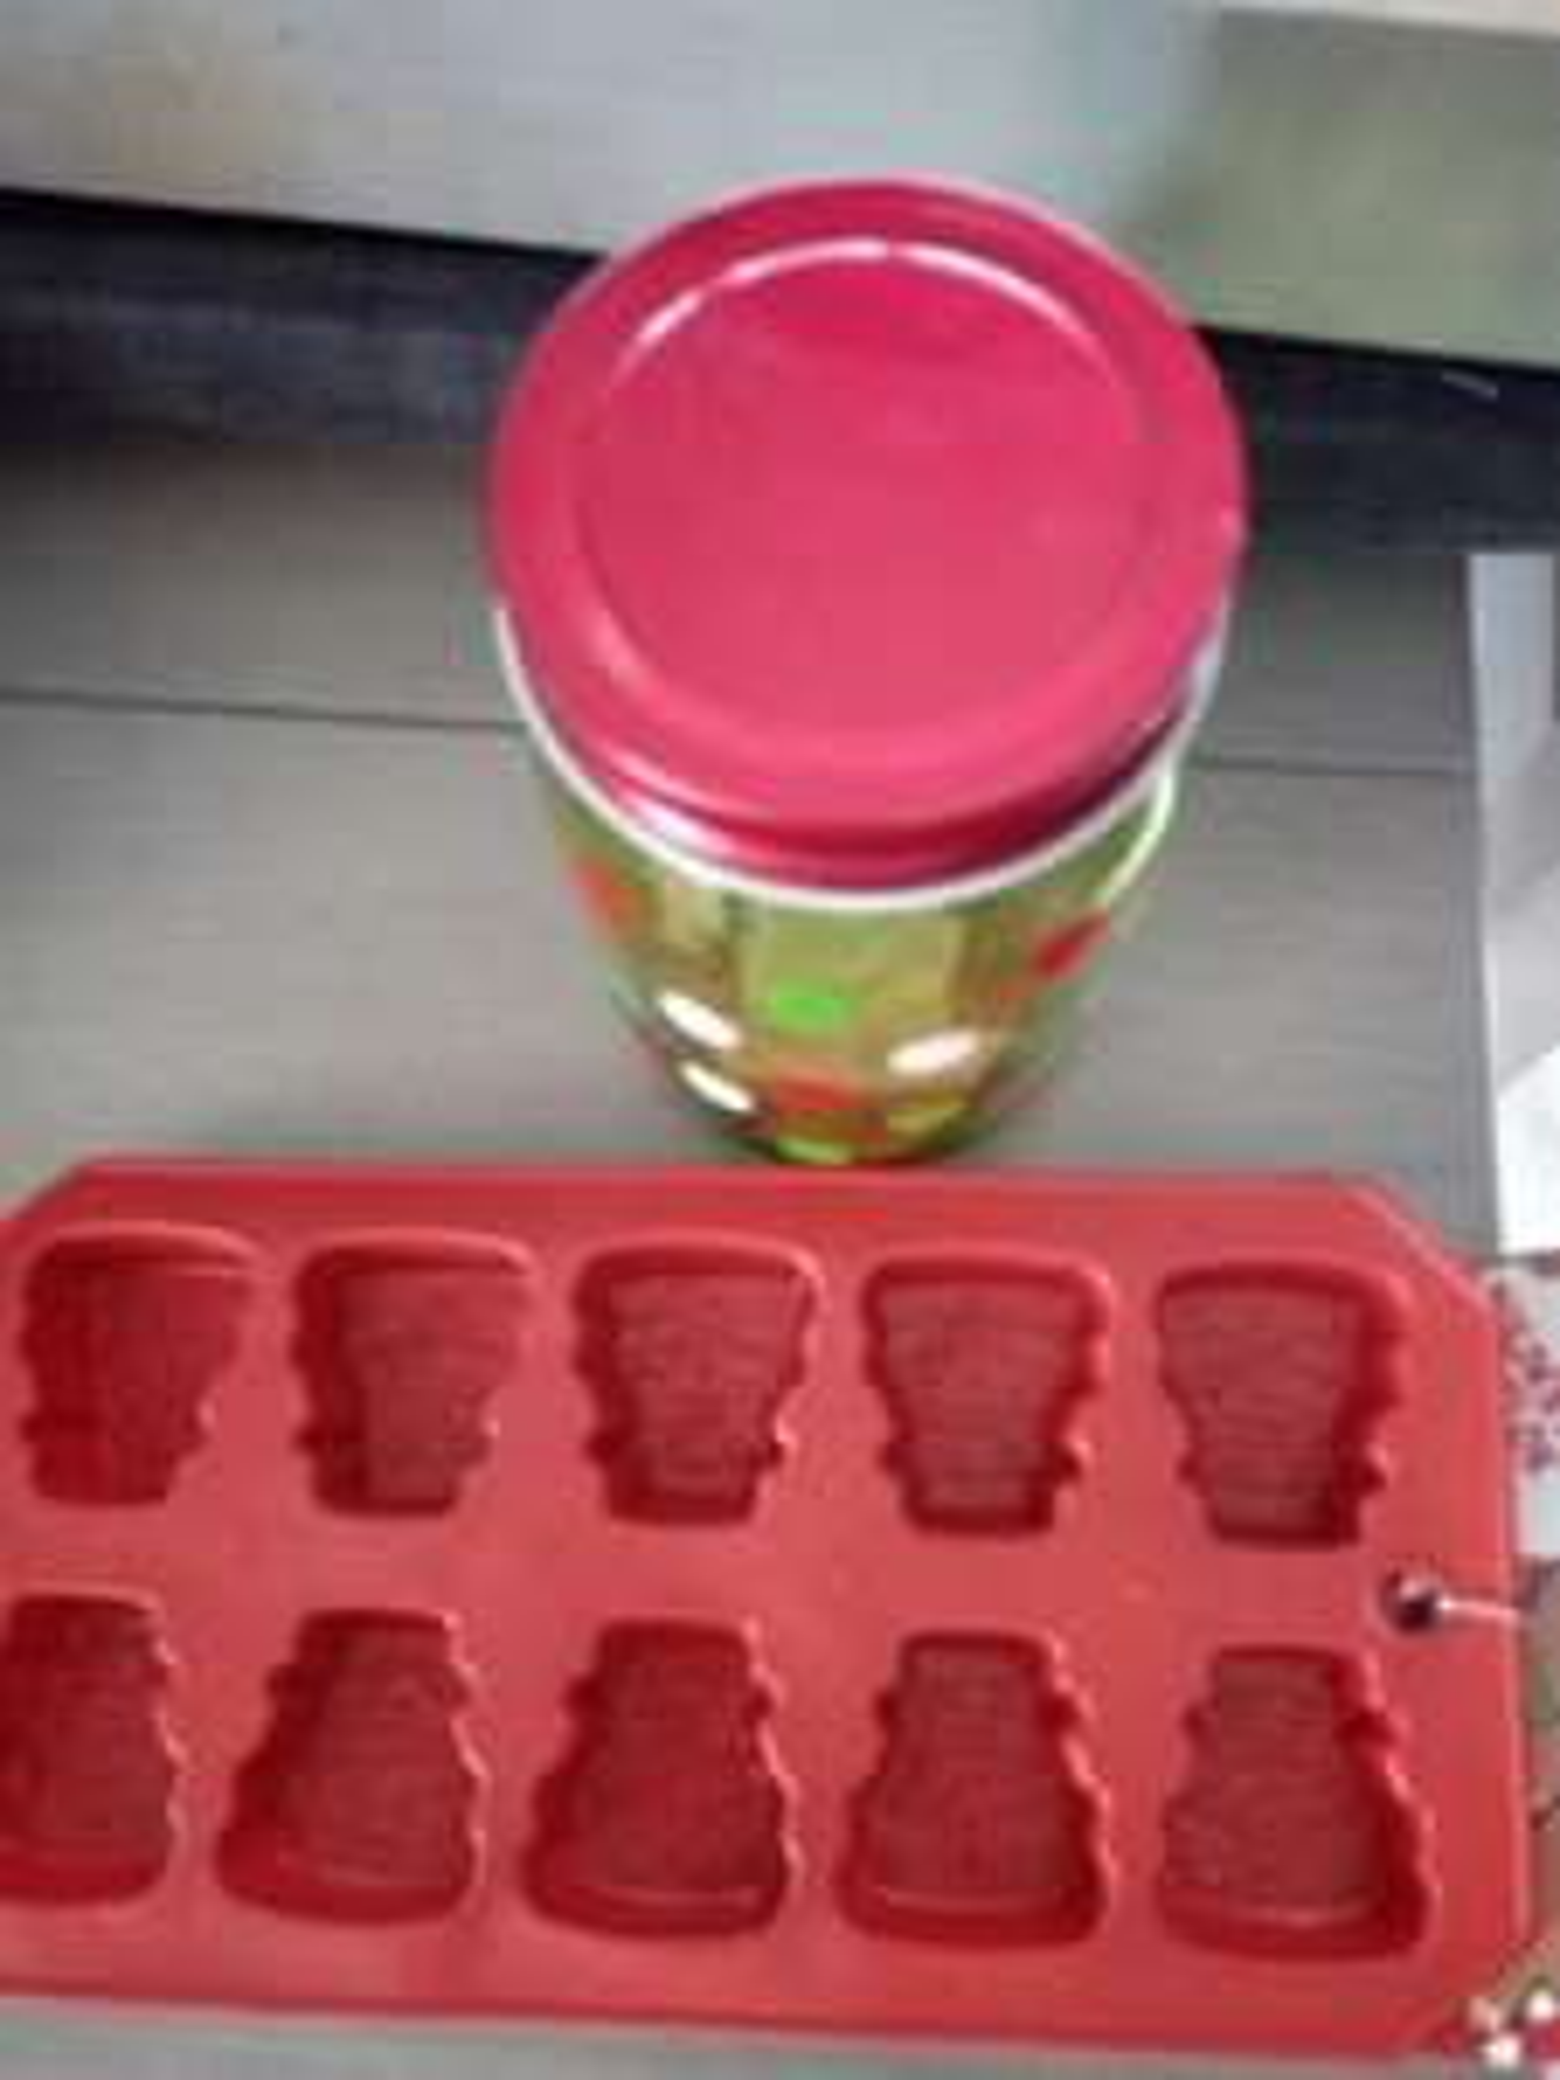 Bodega Aurrerá: Canister y molde para hielos $3.01